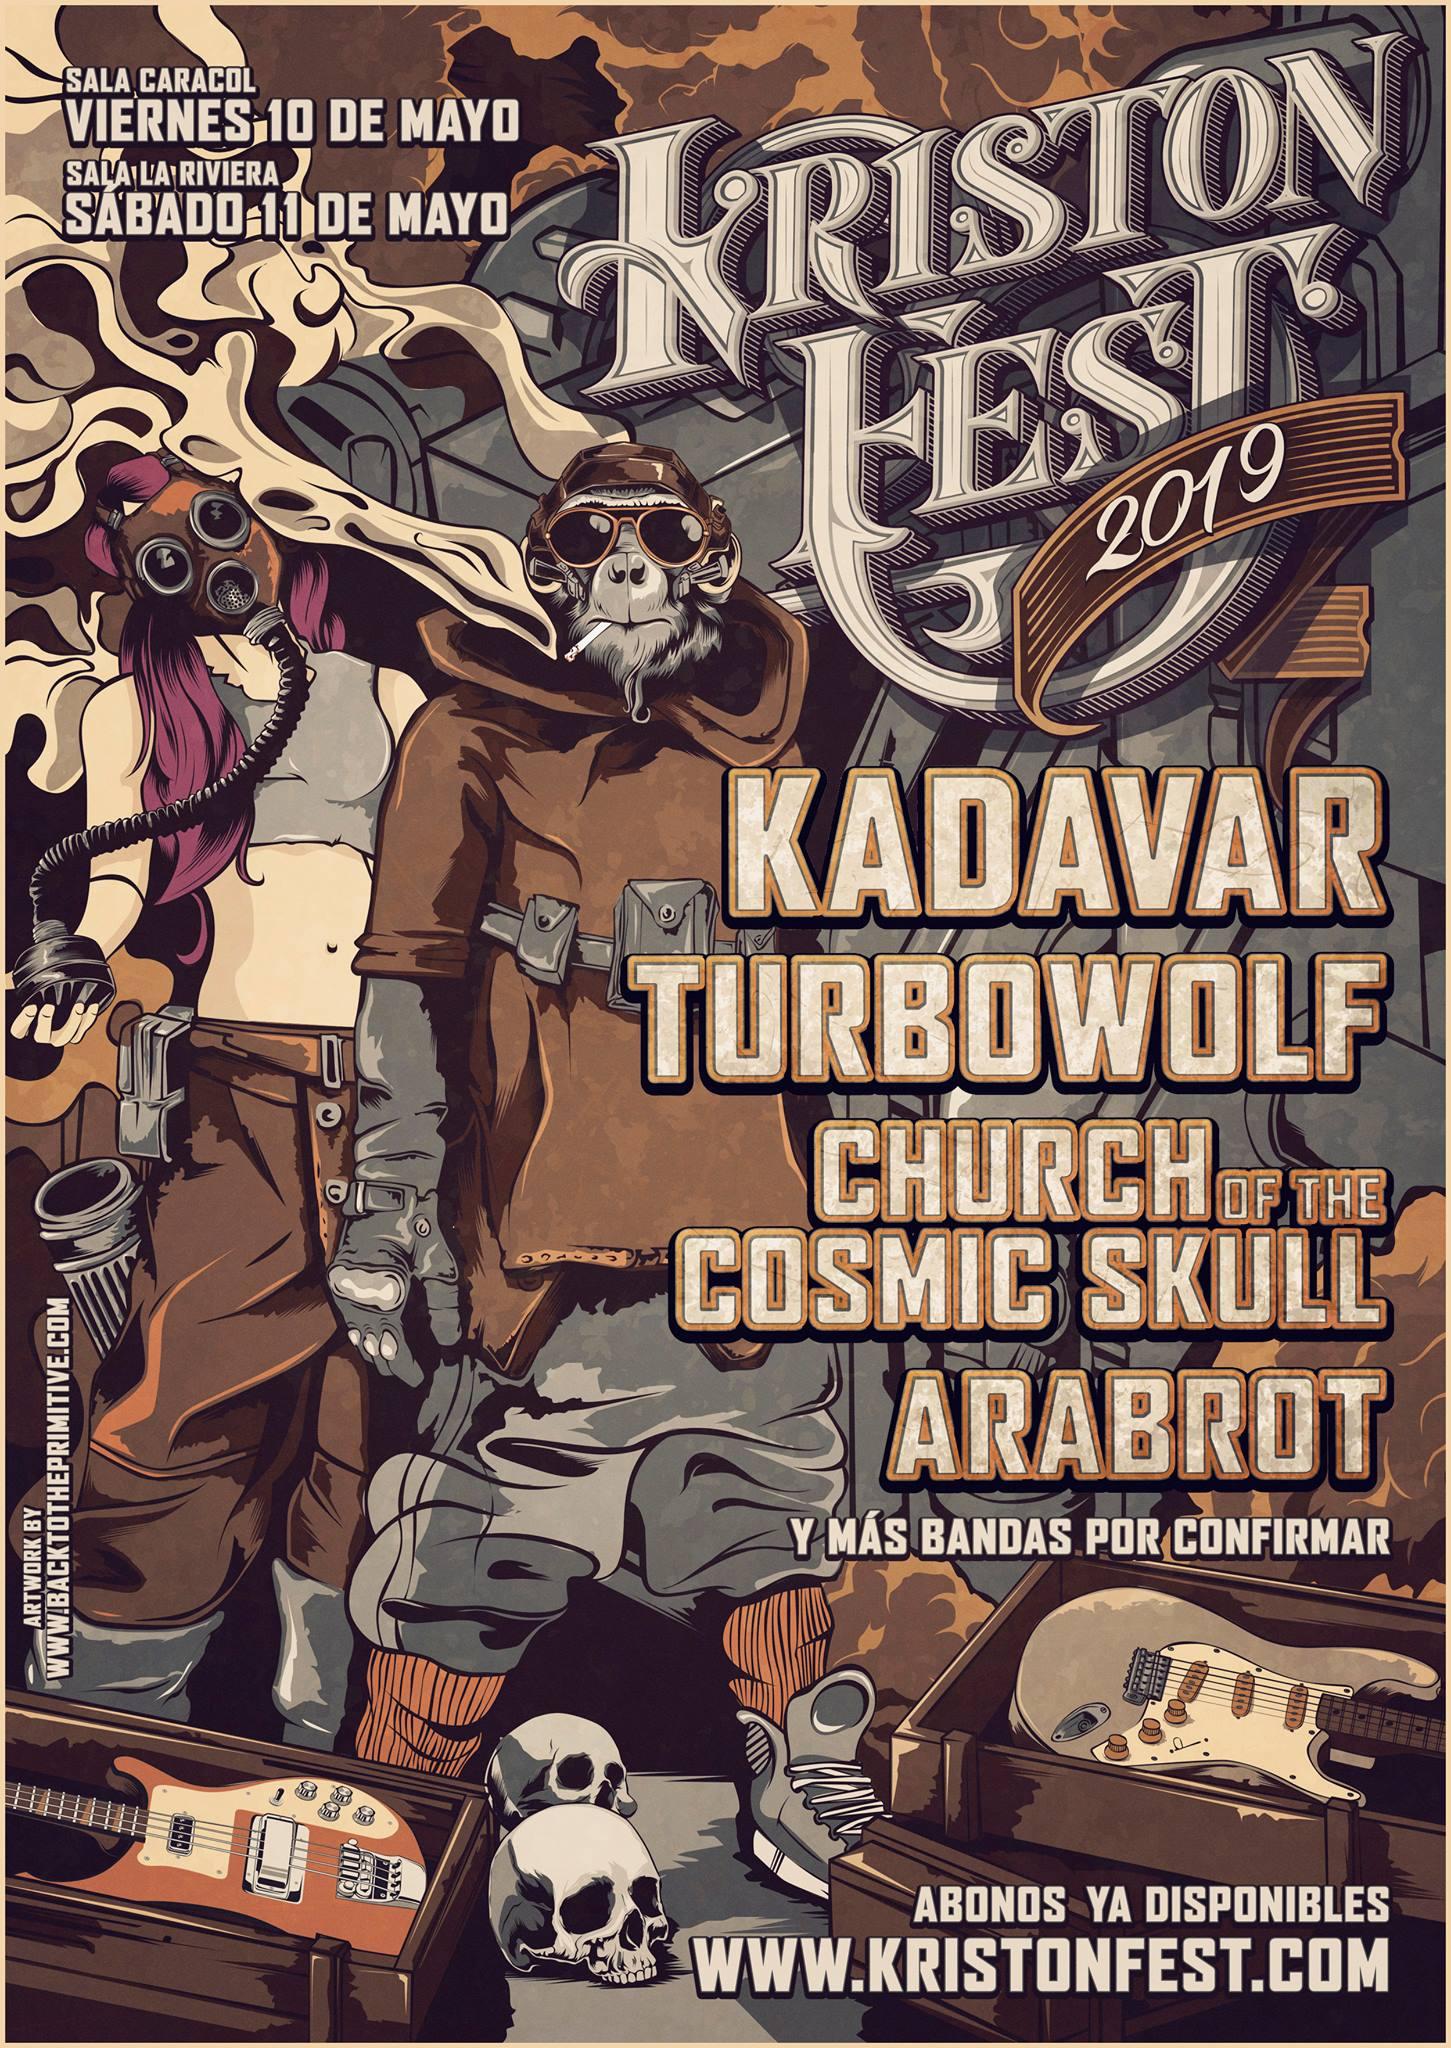 kristonfest 2019 poster